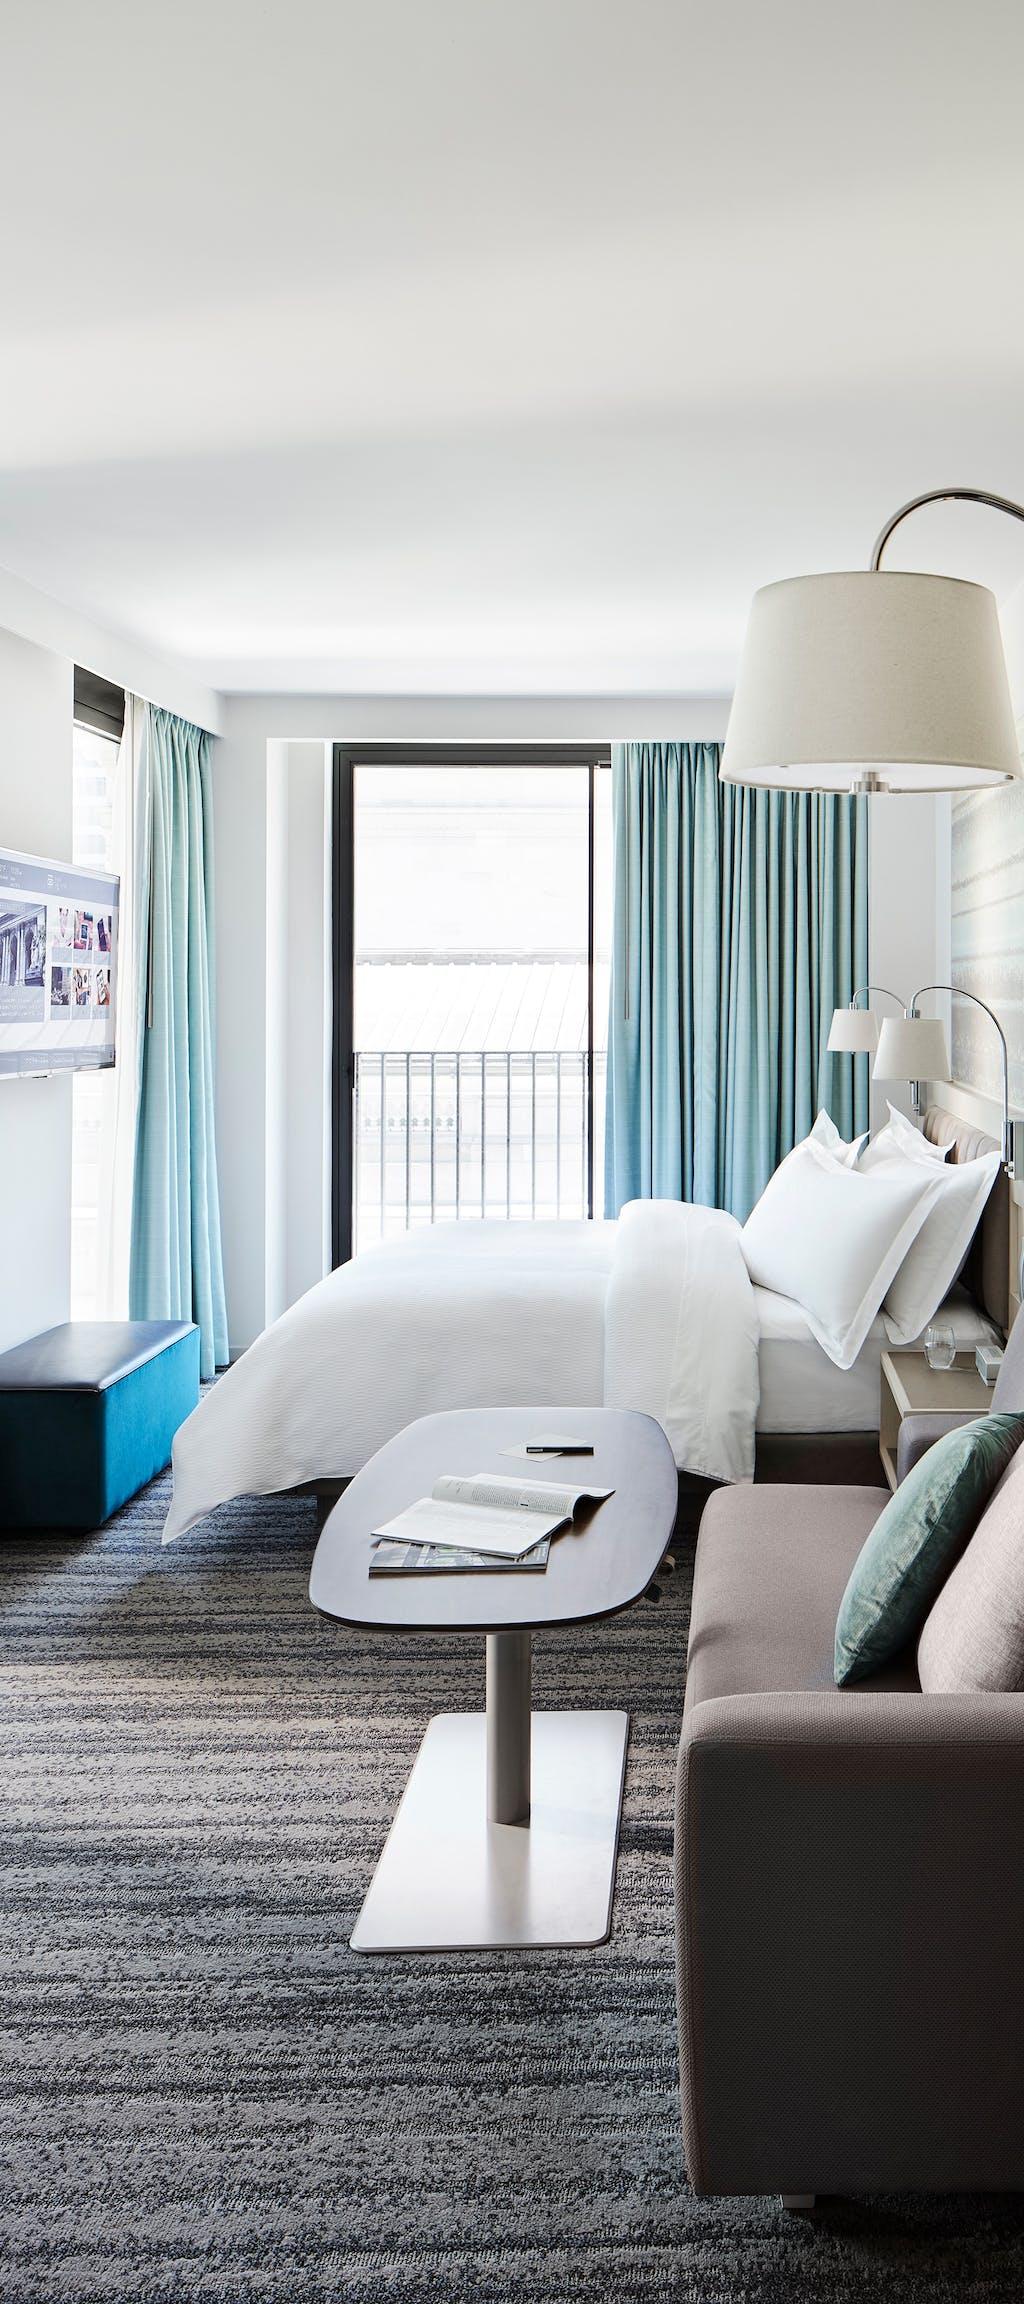 Park Terrace Hotel Rooms